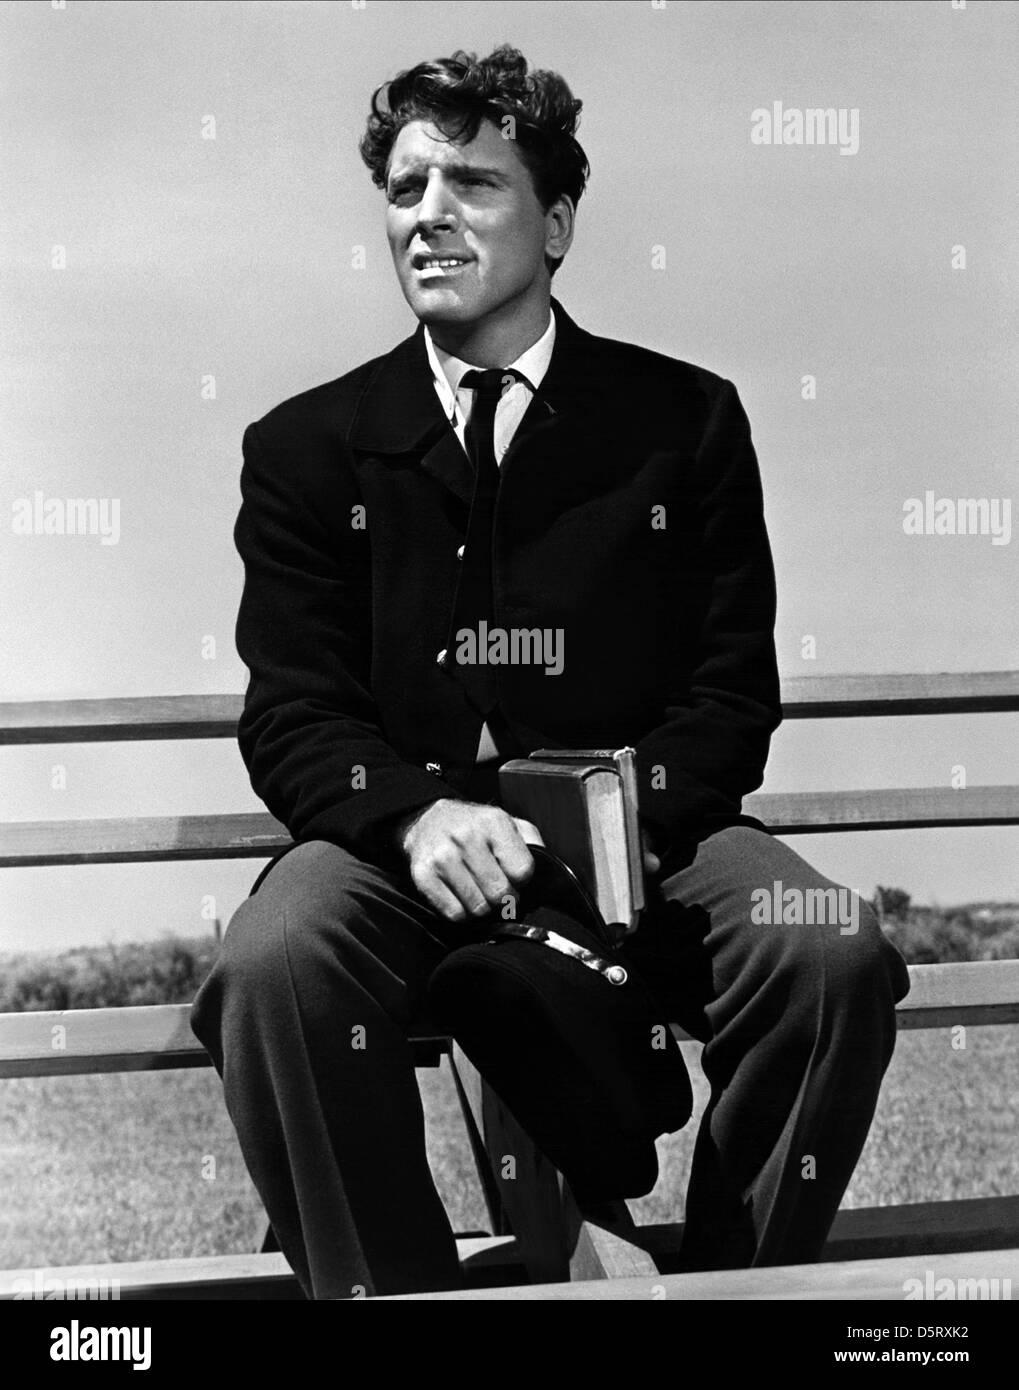 BURT LANCASTER MAN OF BRONZE (1951) - Stock Image